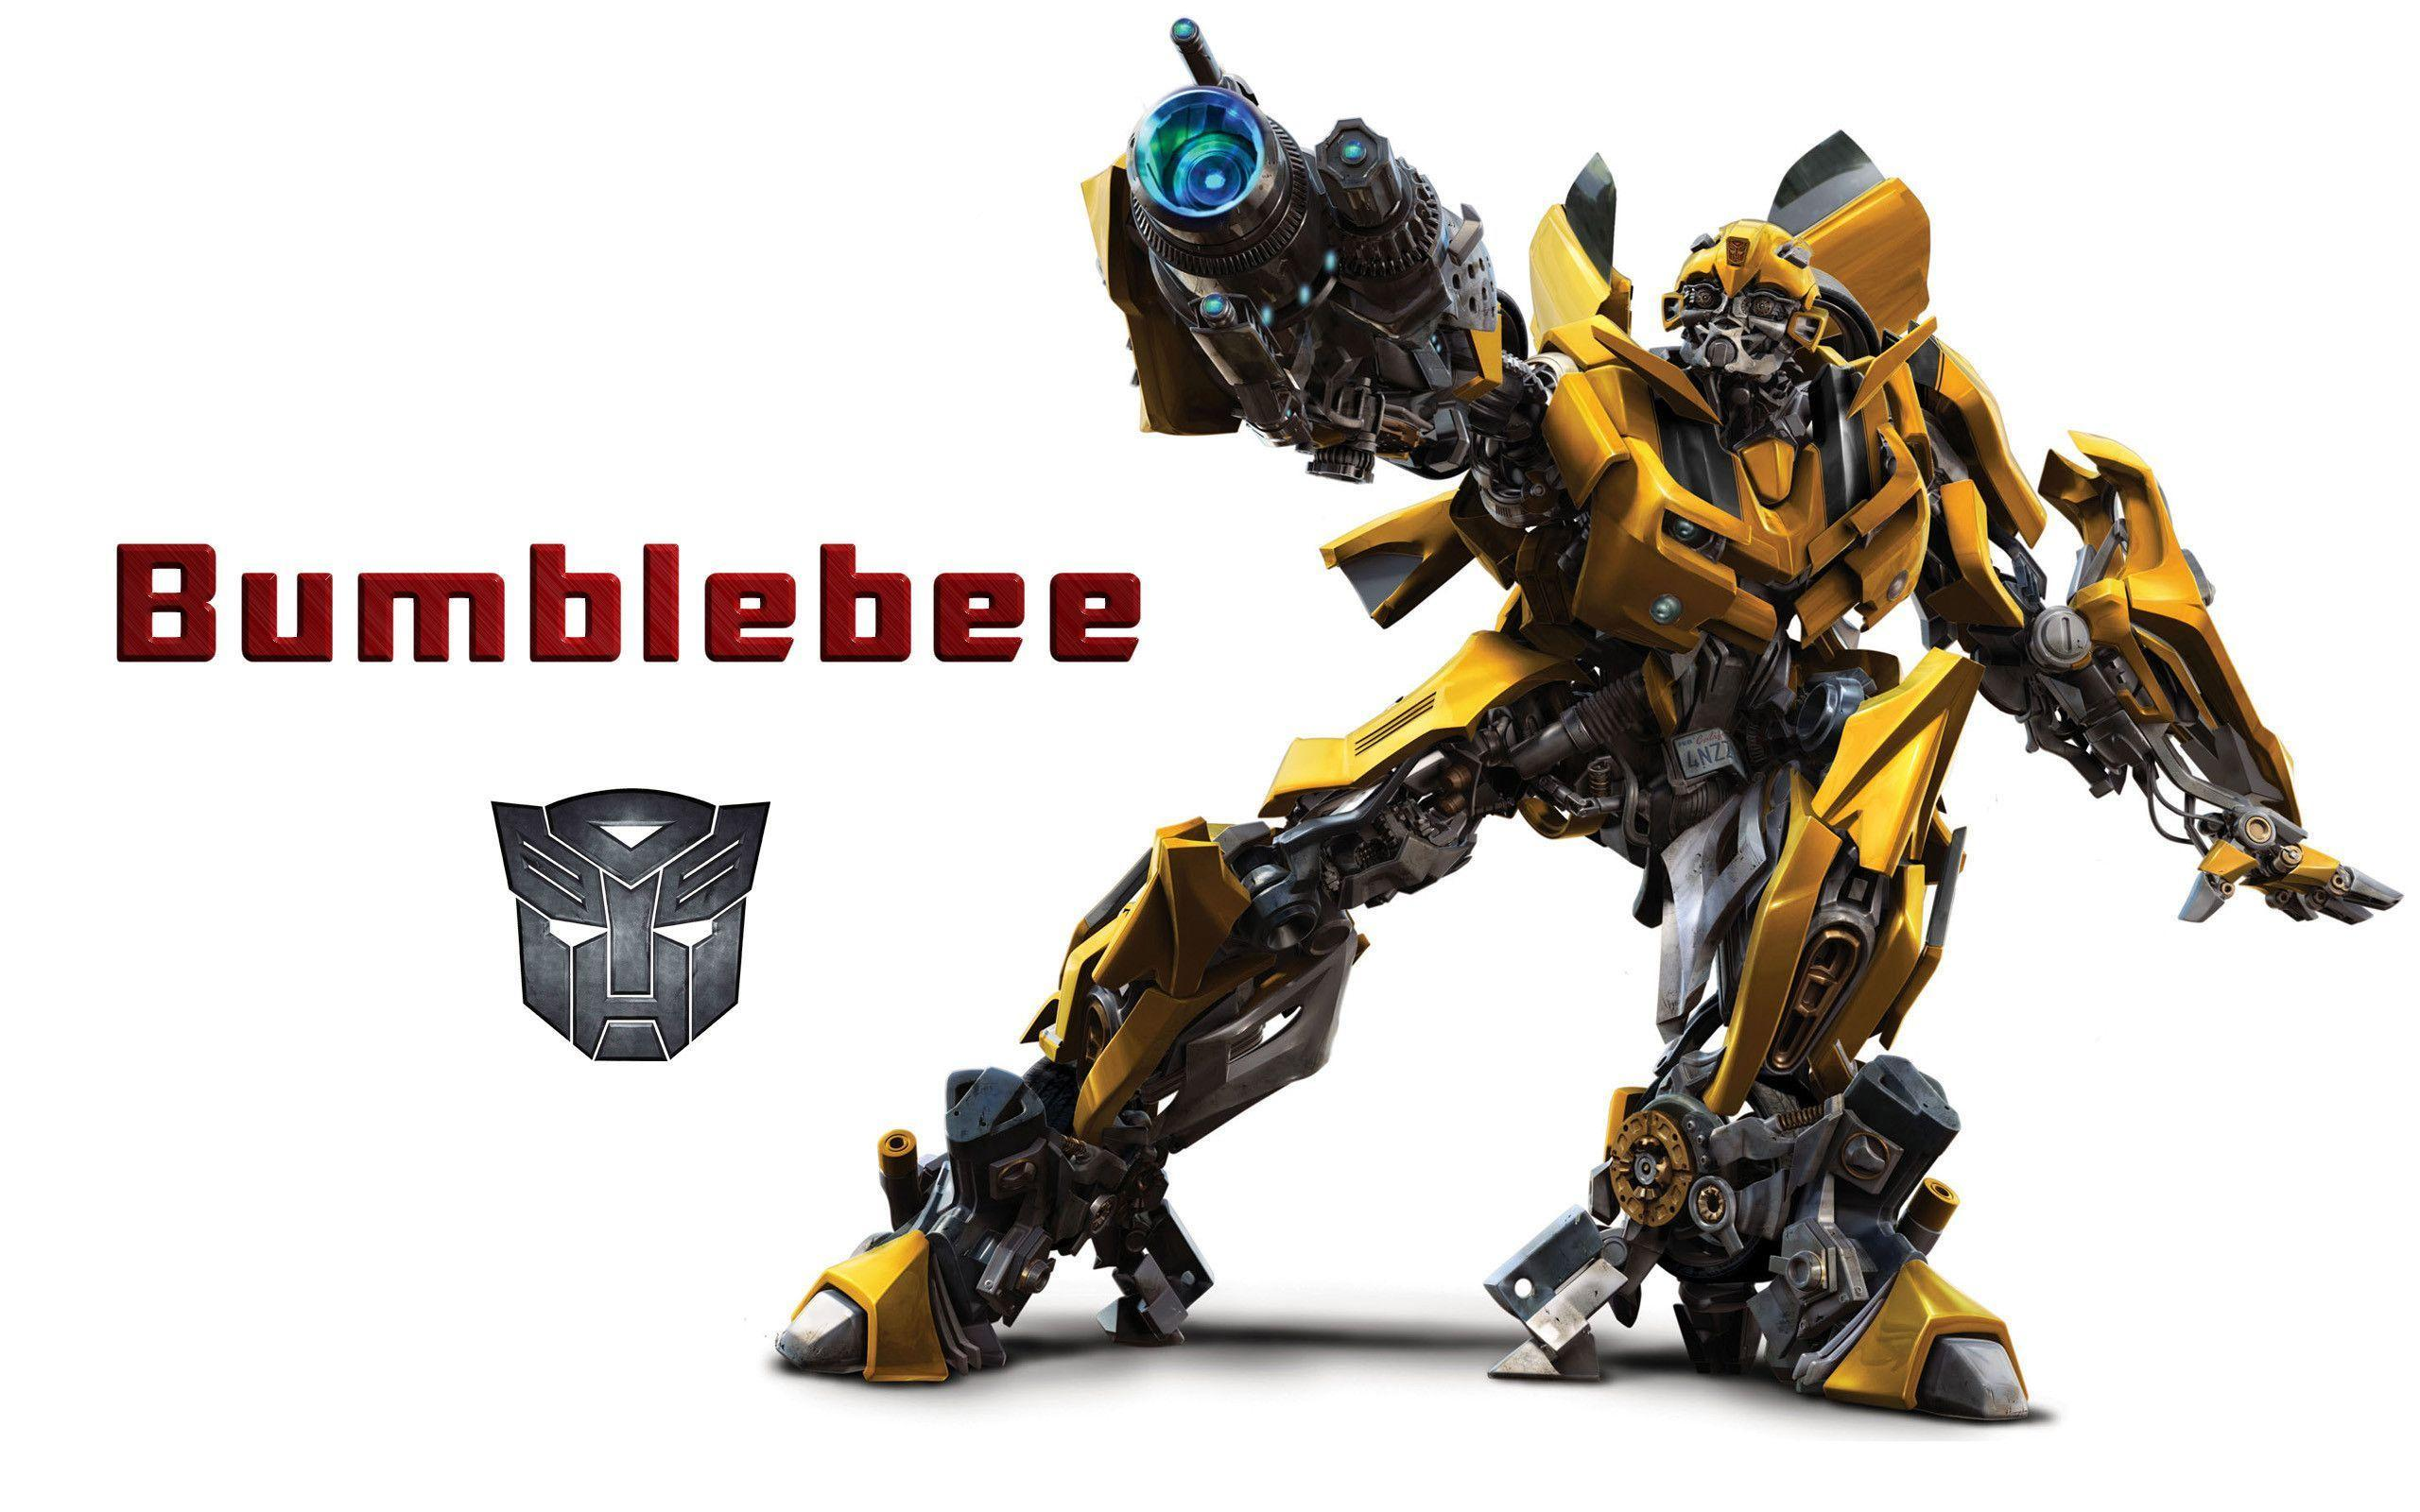 transformers 2 bumblebee wallpapers wallpaper cave